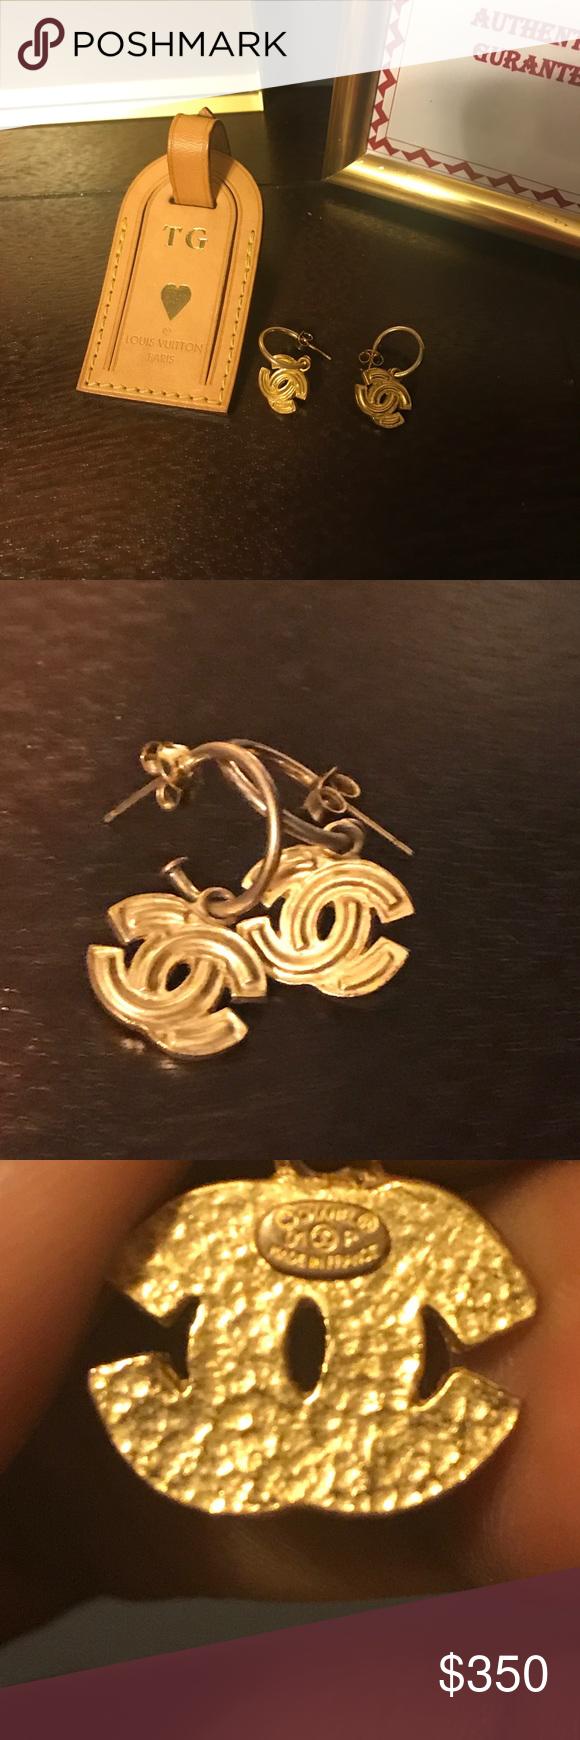 Authentic chanel vintage earrings gold cc logo Vintage